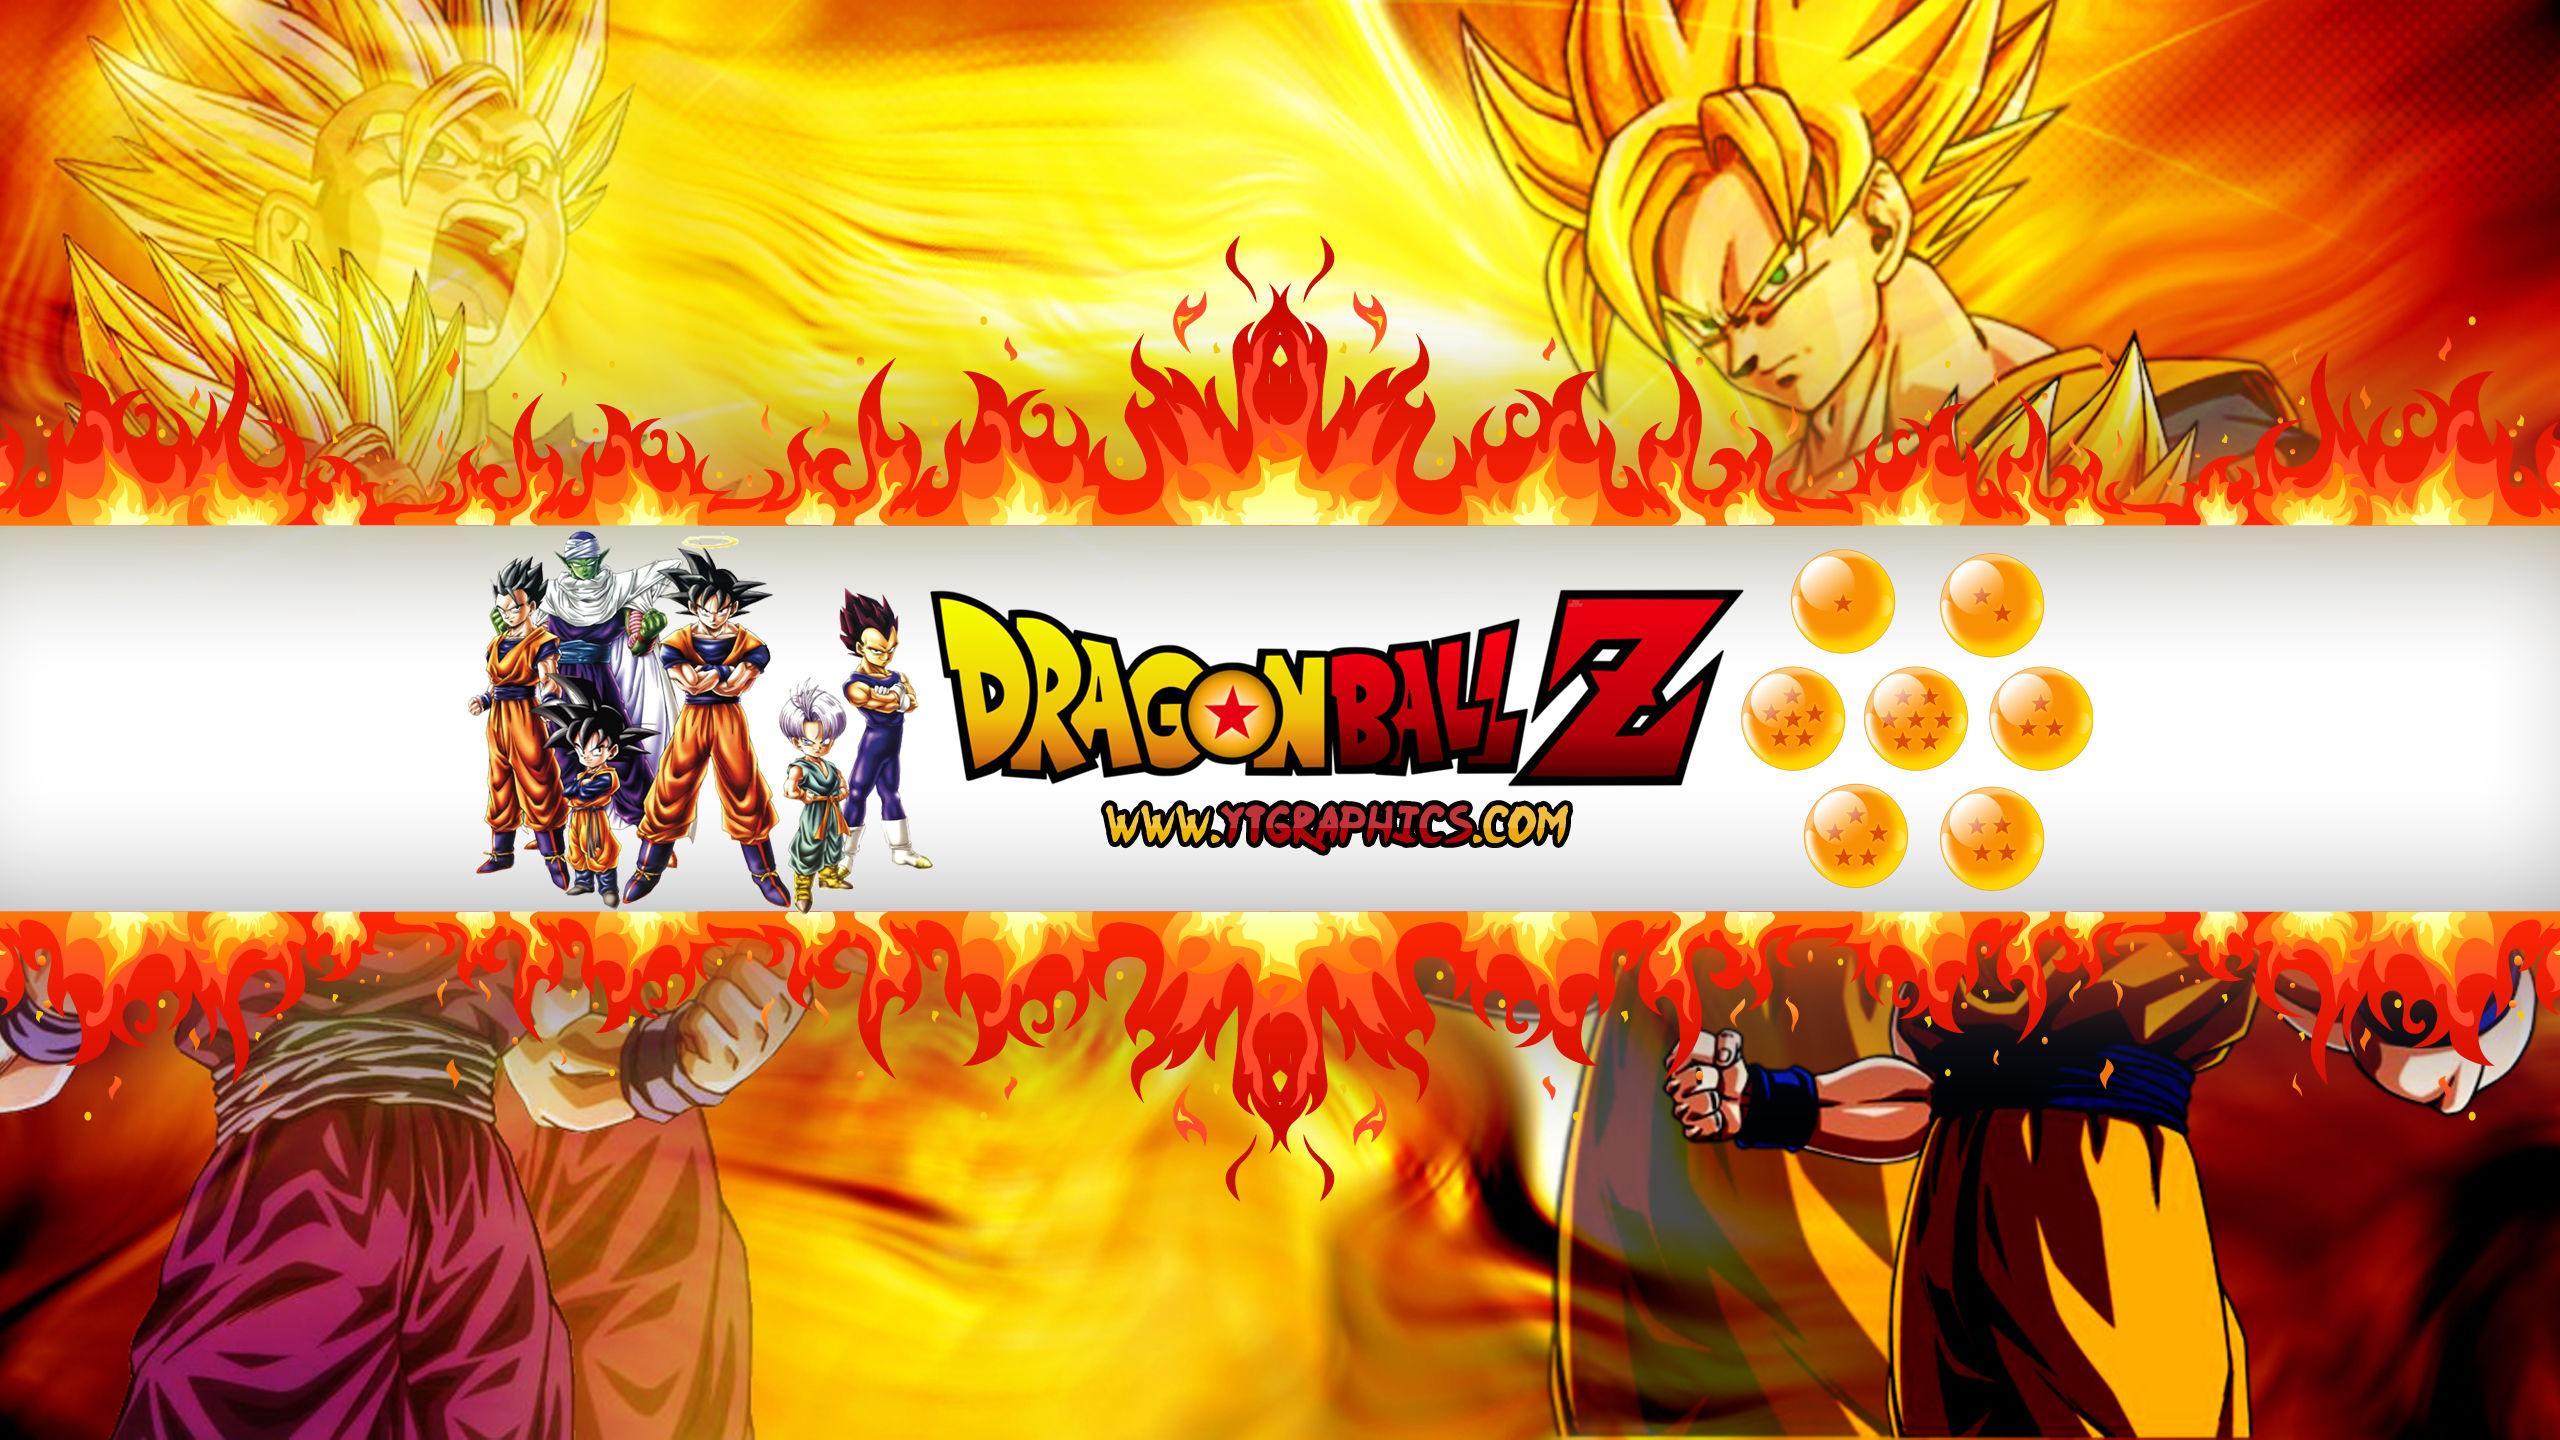 Dragon Ball Z Youtube Channel Art Banner